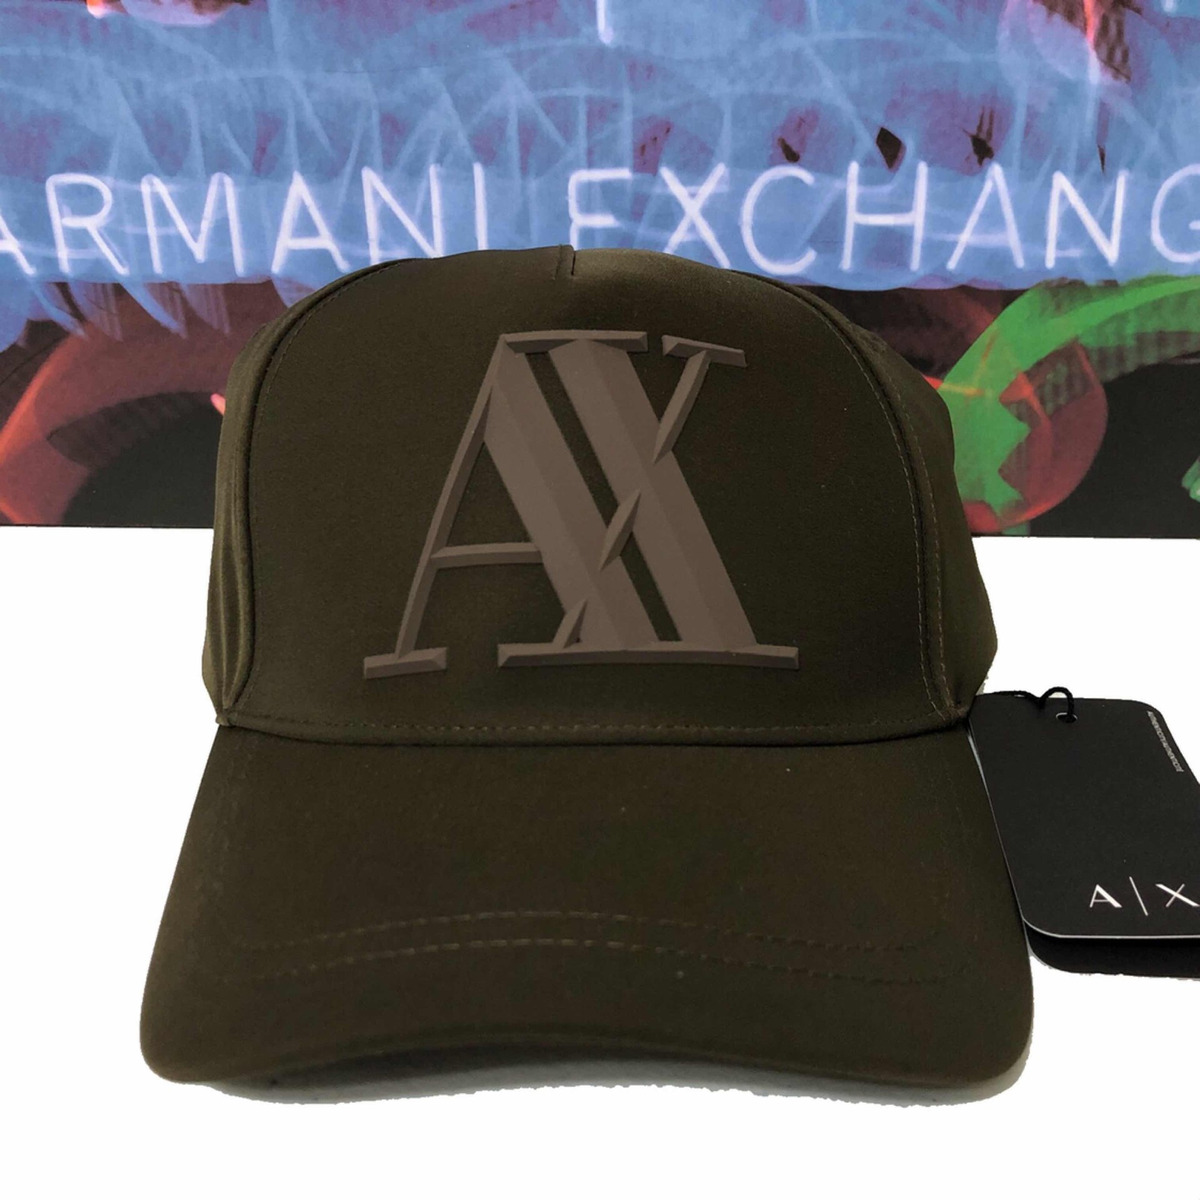 gorra armani exchange 100% original cc518 rubber logo. Cargando zoom. 51f3c6f0dbd